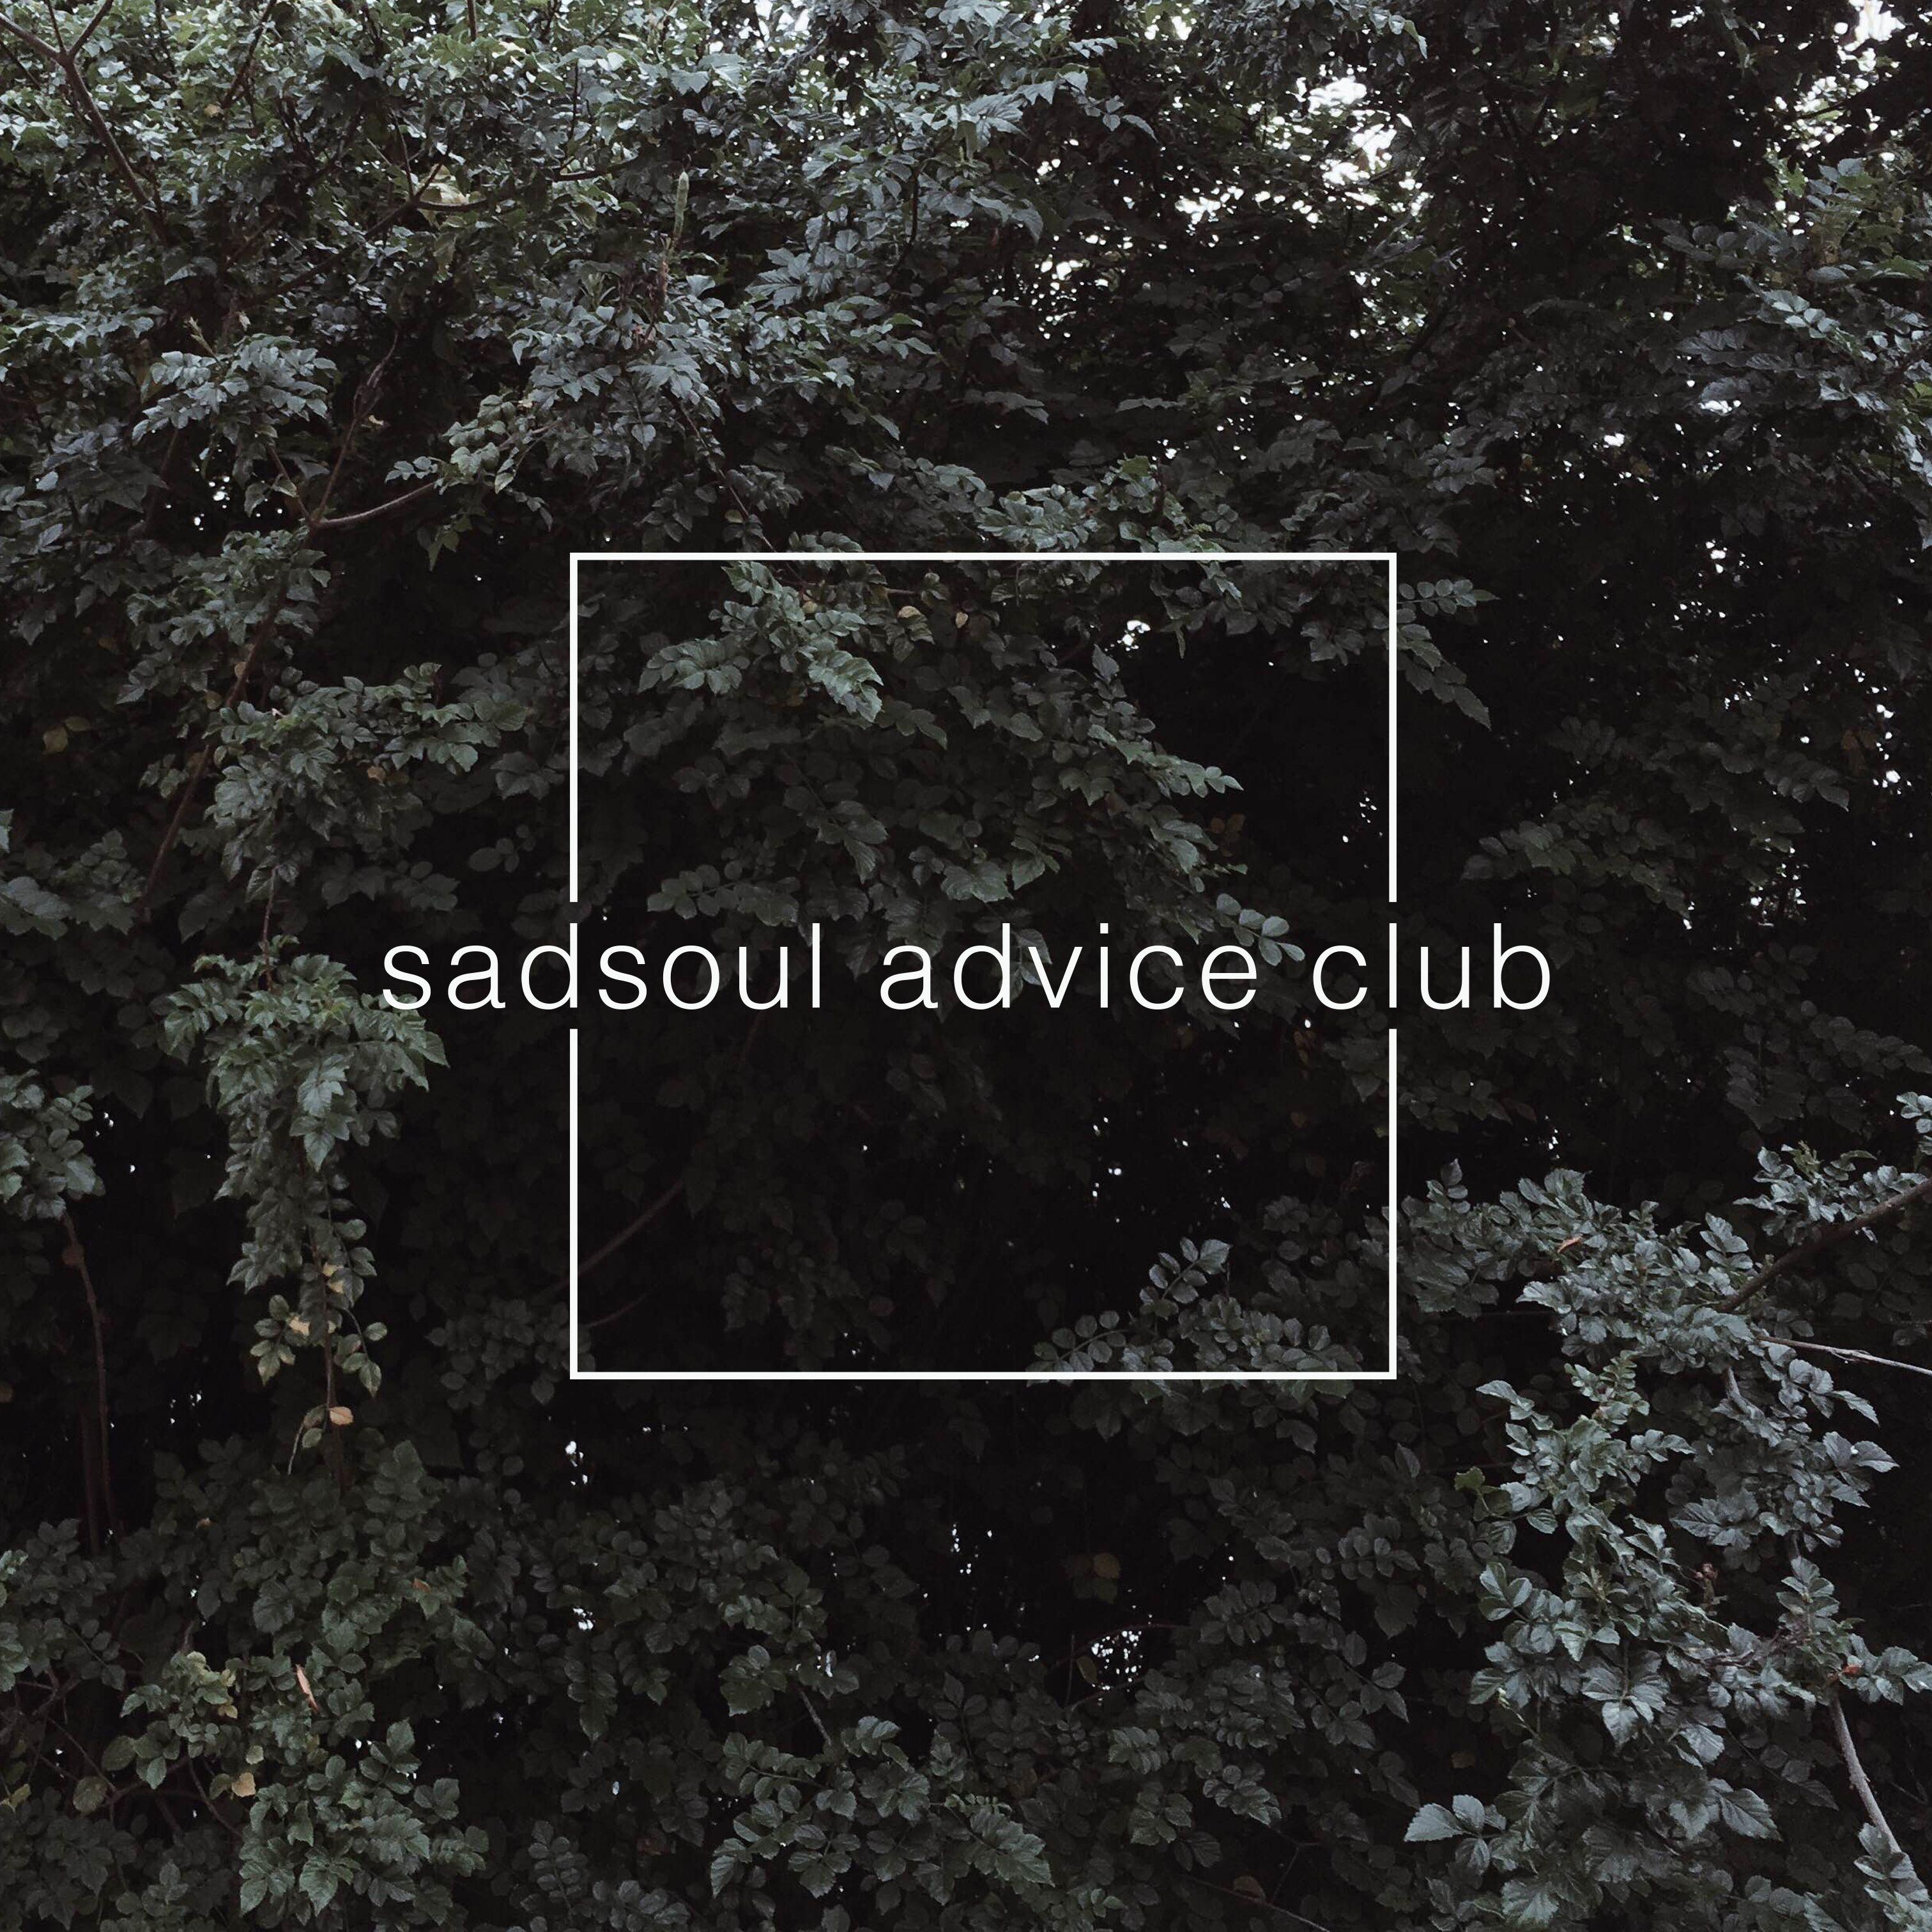 sadsoul advice club